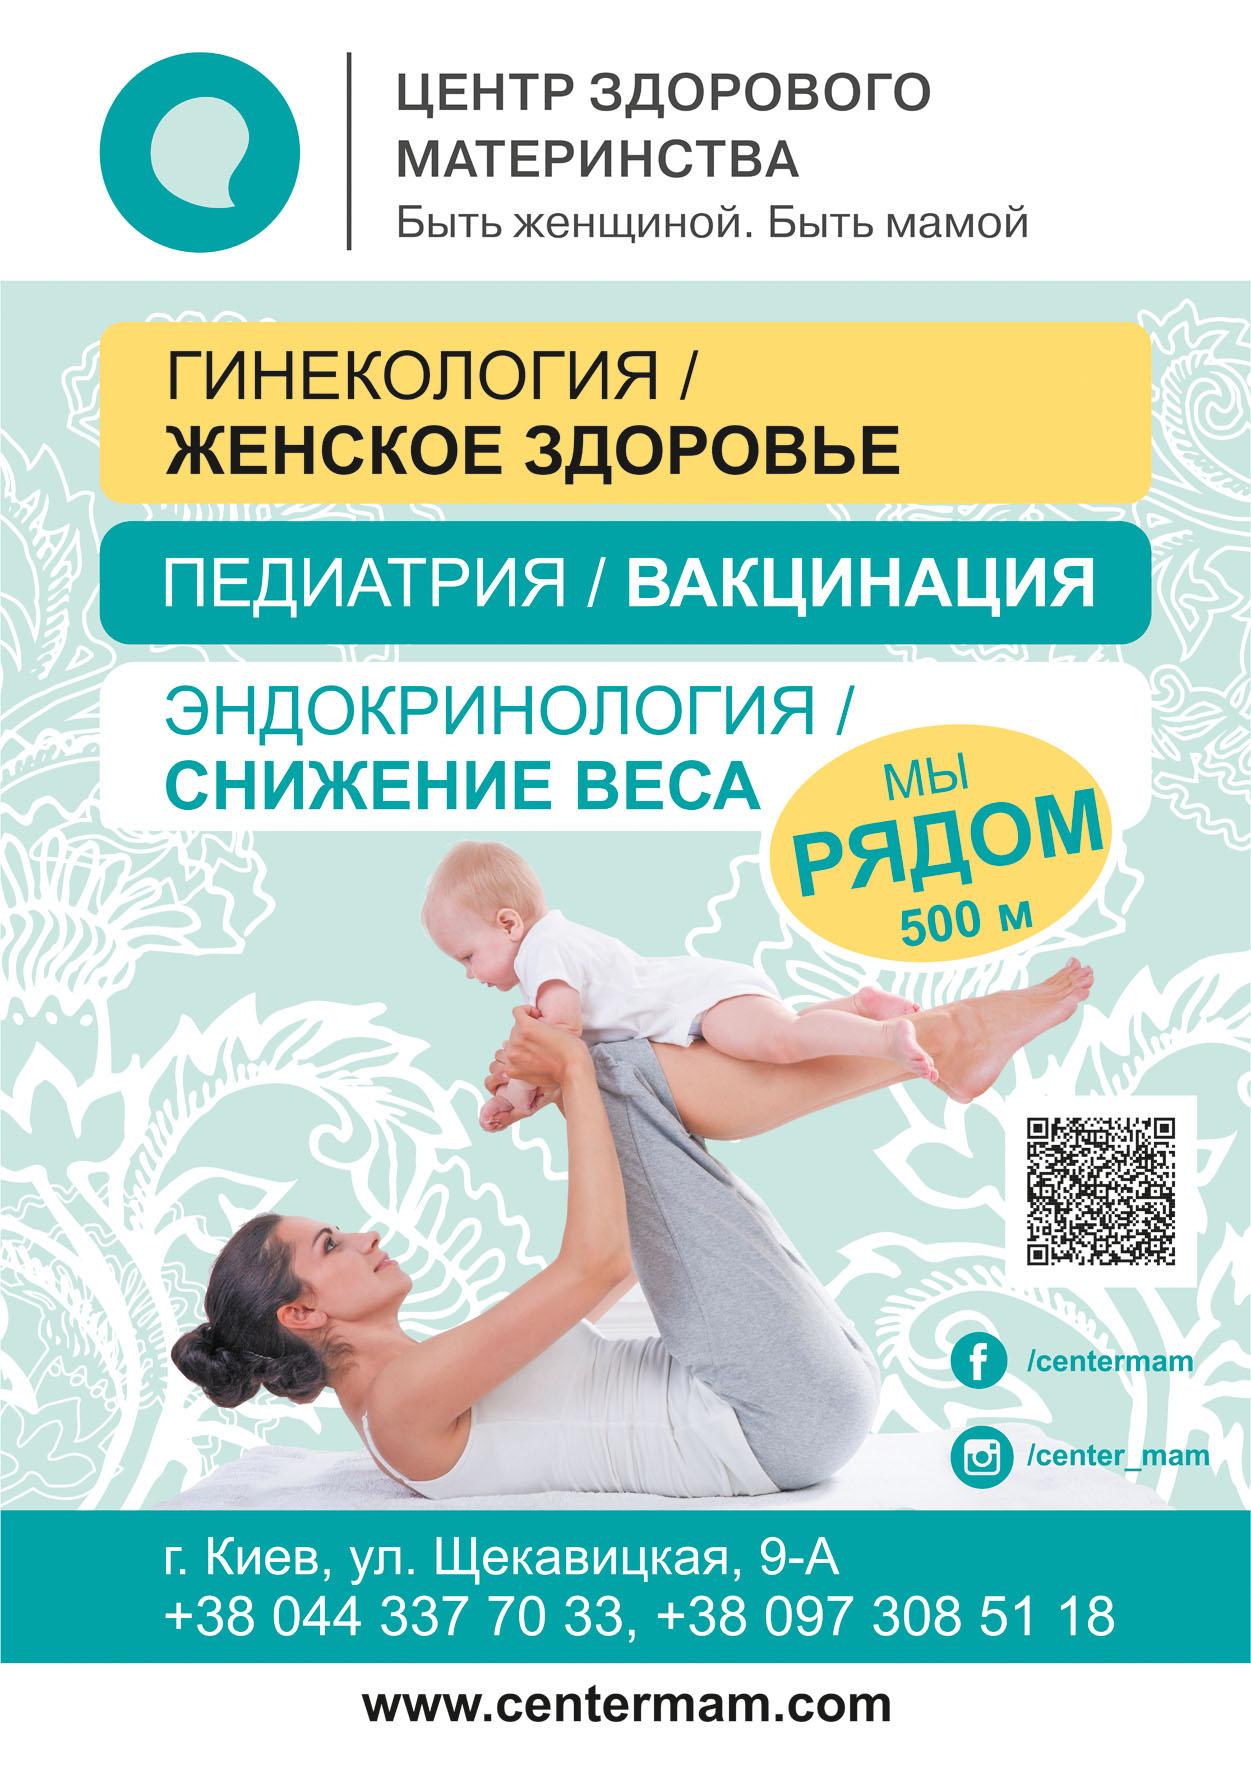 (05) А1 плакат ЦЗМ Утв